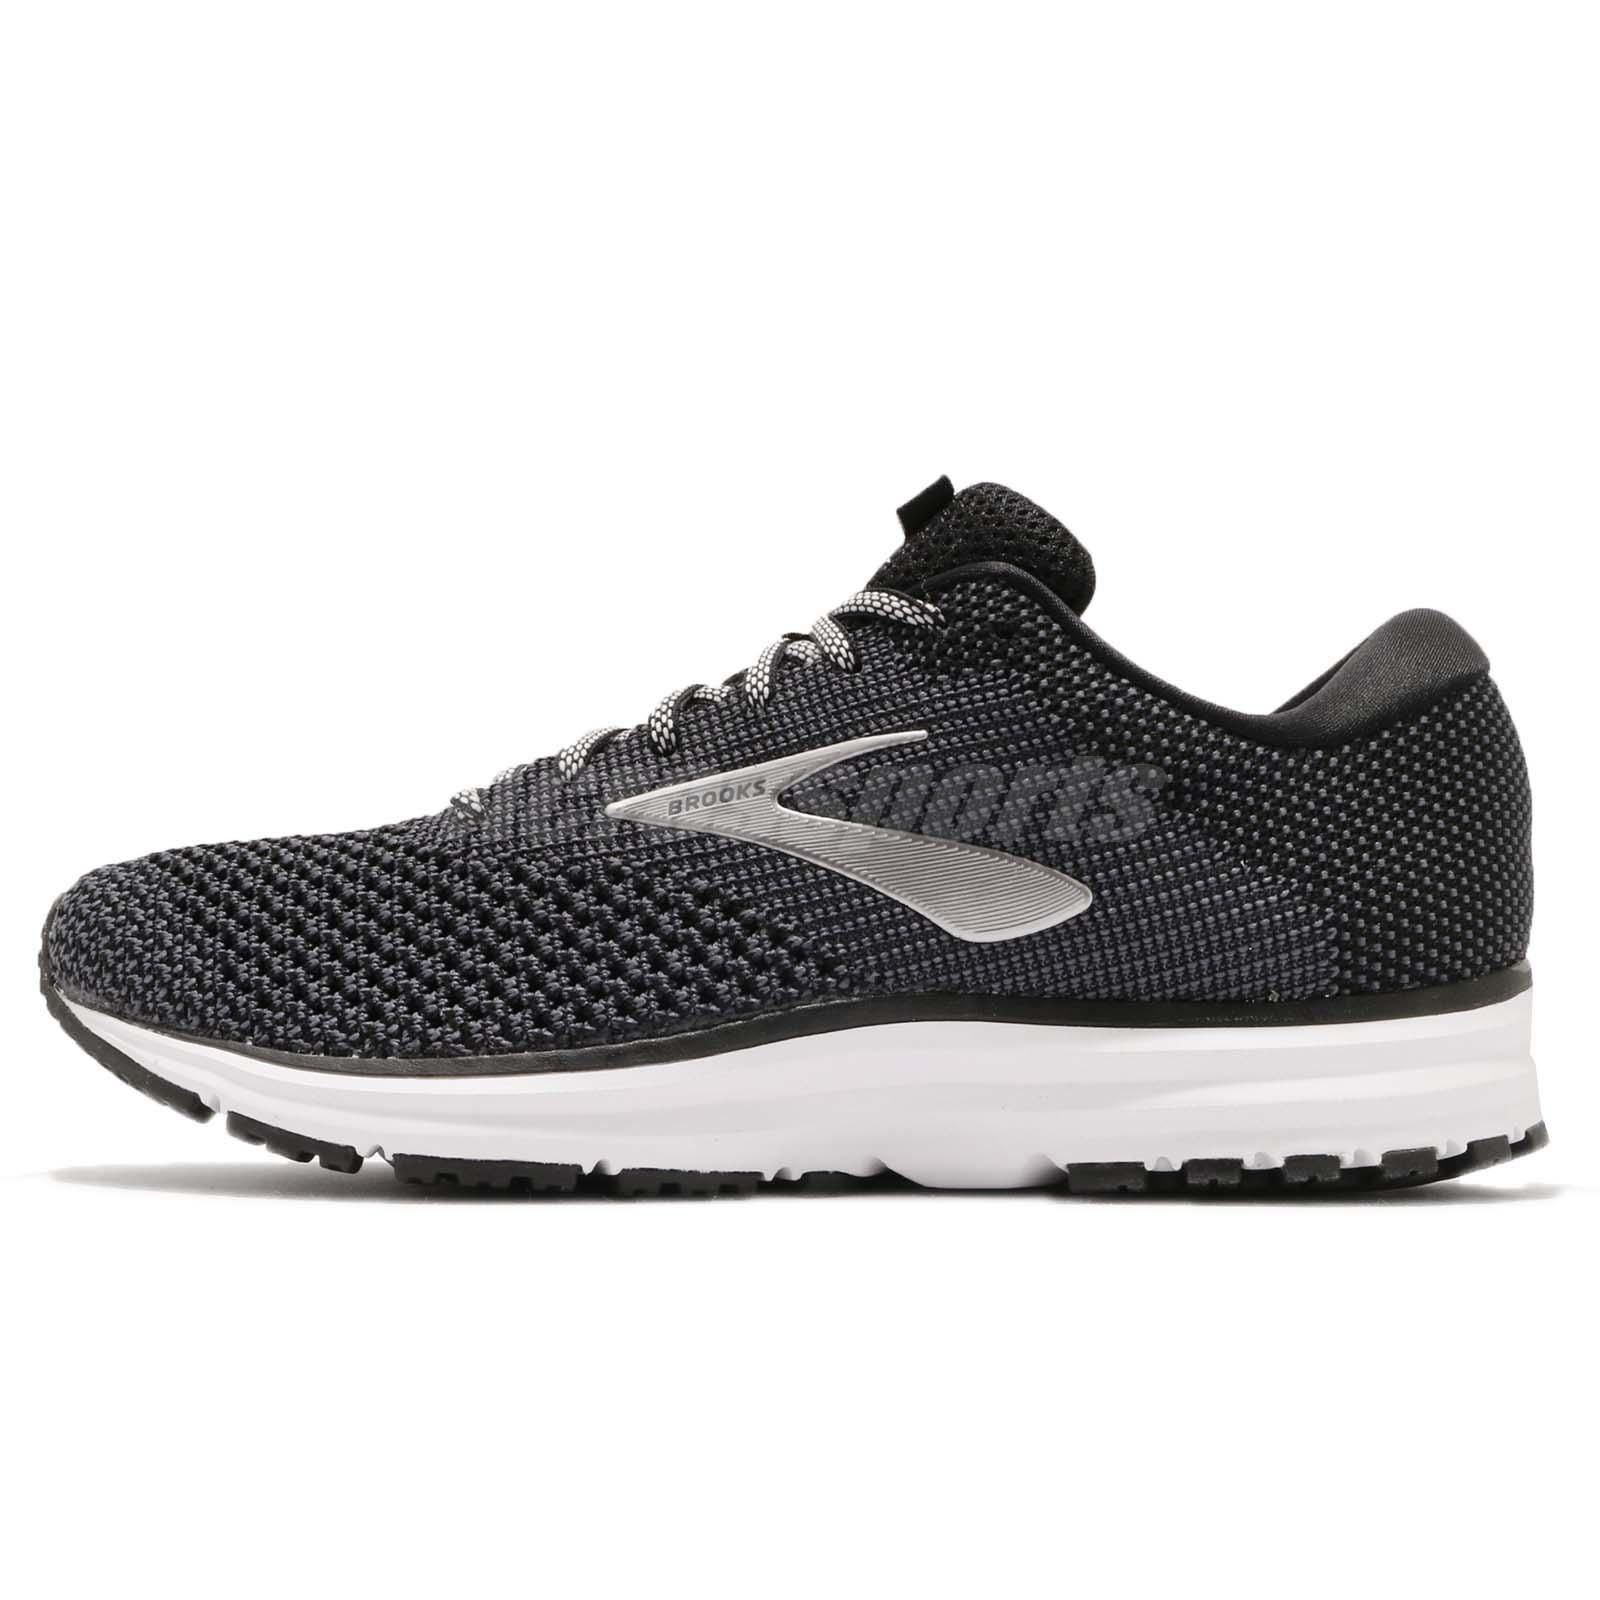 035aaaa54d9 Brooks Revel 2 Black Grey White Men Running Training Shoes Sneakers 110292  1D